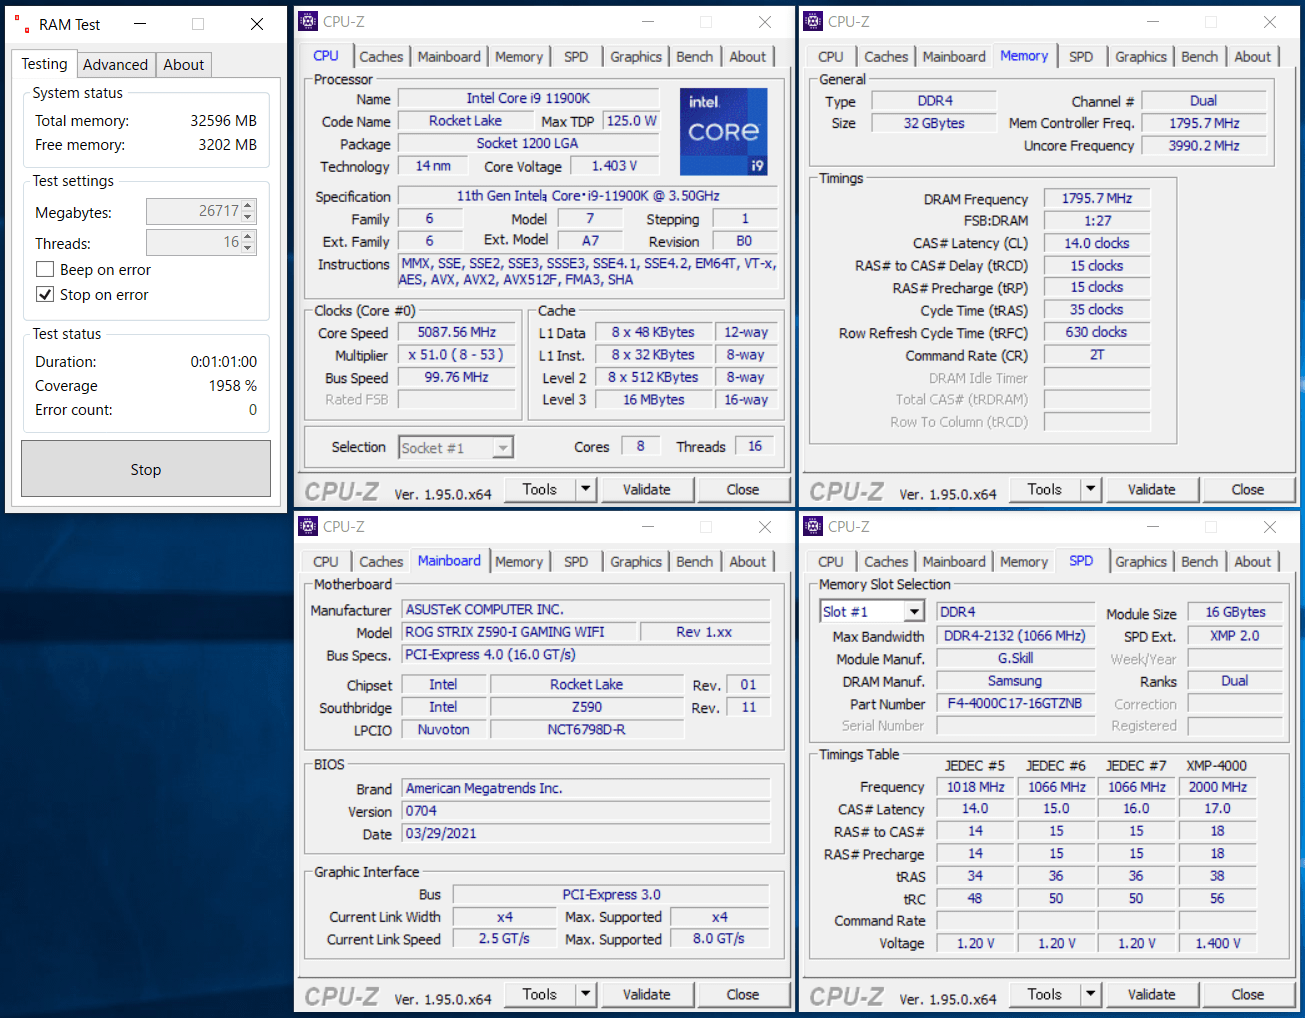 ASUS ROG STRIX Z590-I GAMING WIFI_11900K_memtest_3600_c14_g1